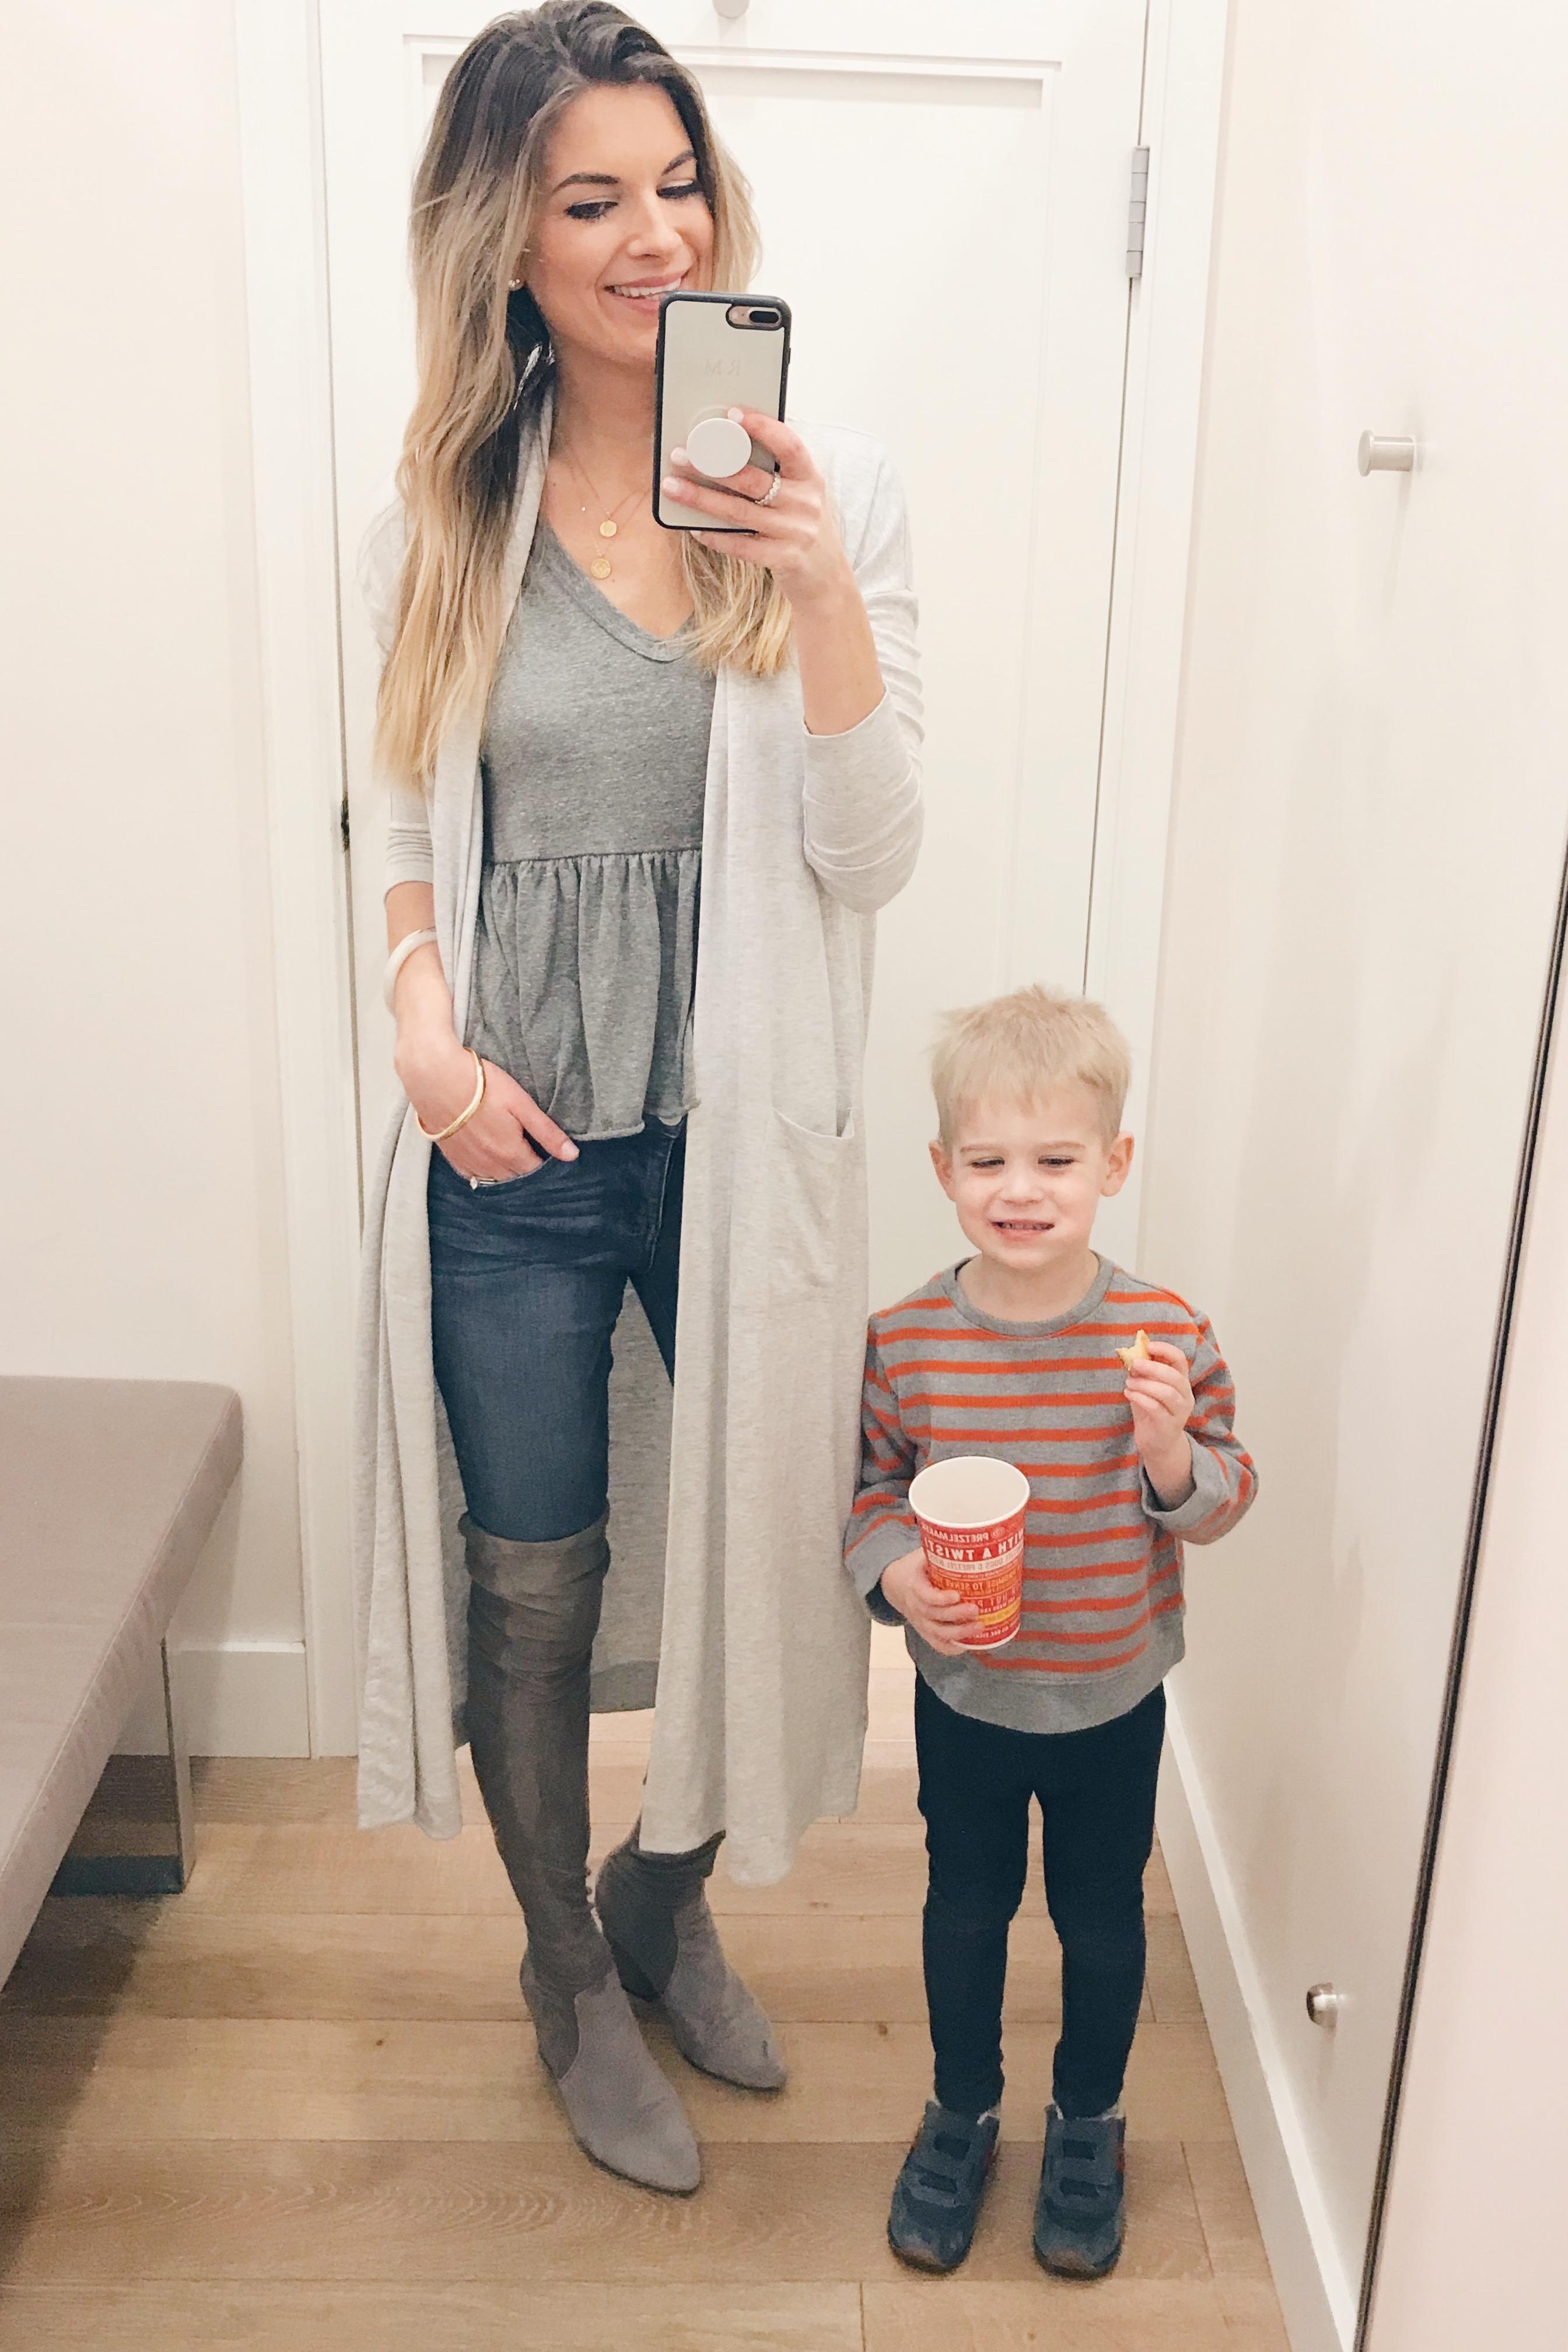 loft sale picks january 2019 - duster cardigan in gray